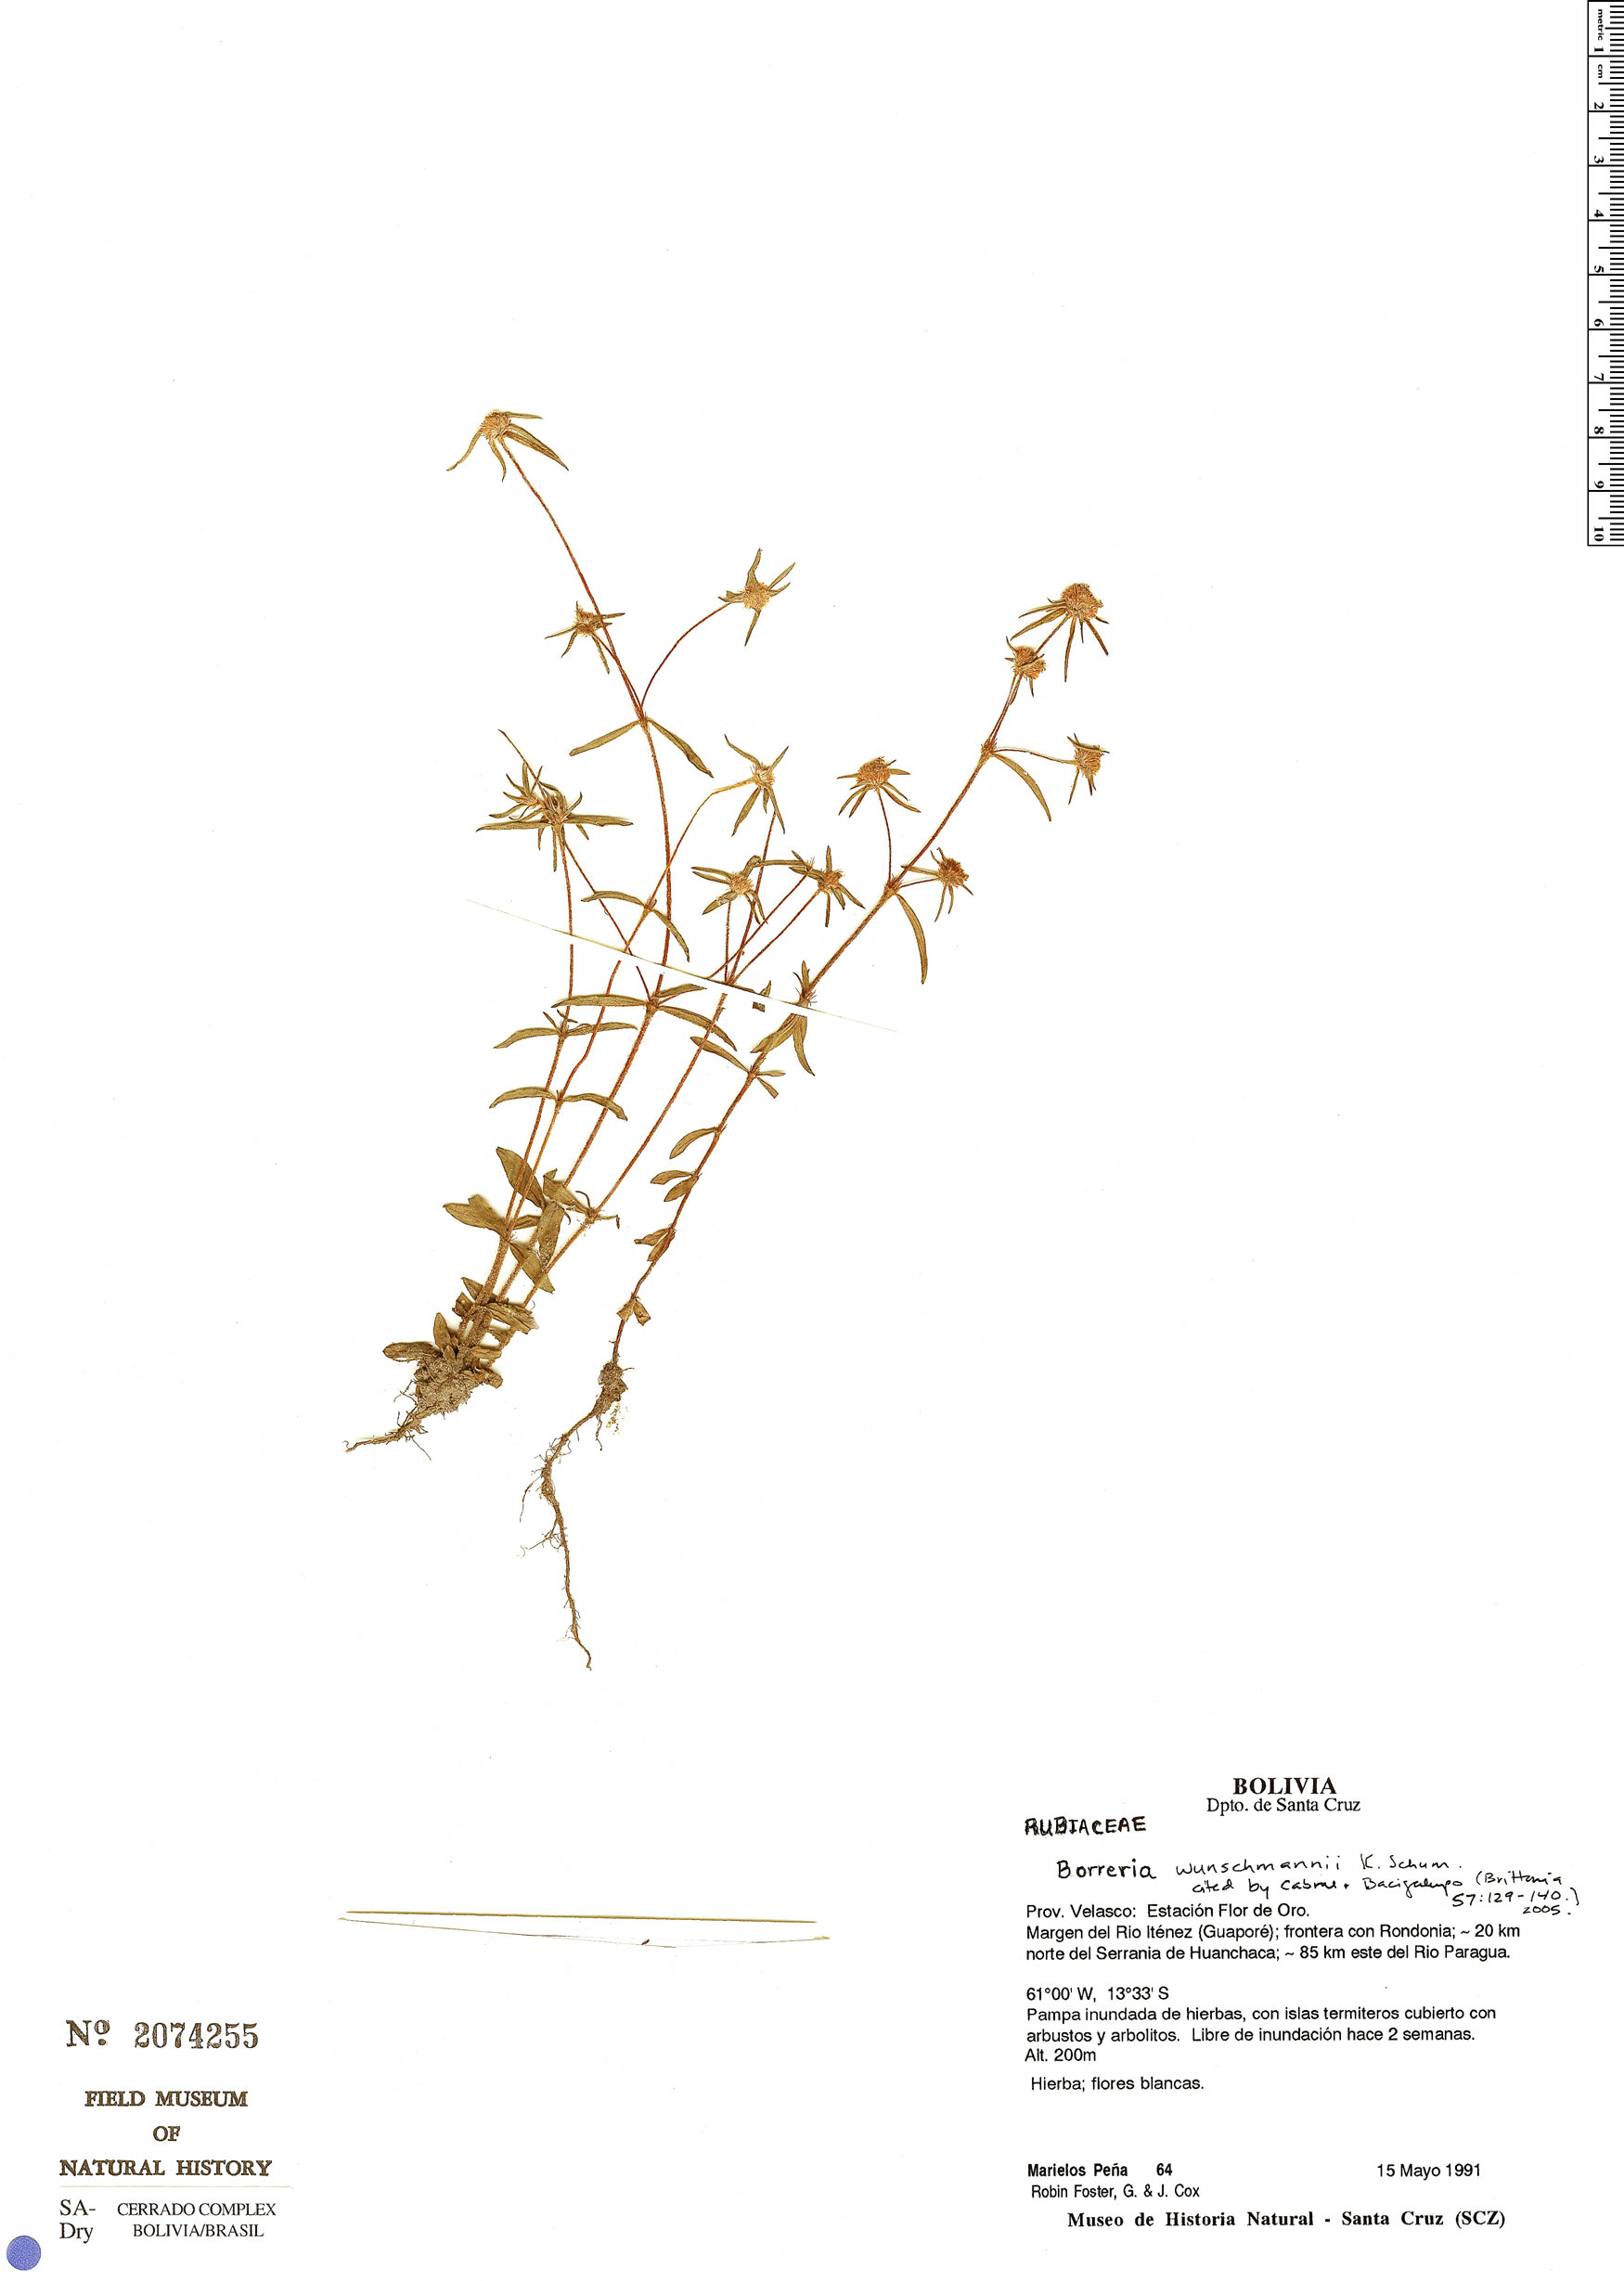 Specimen: Borreria wunschmannii